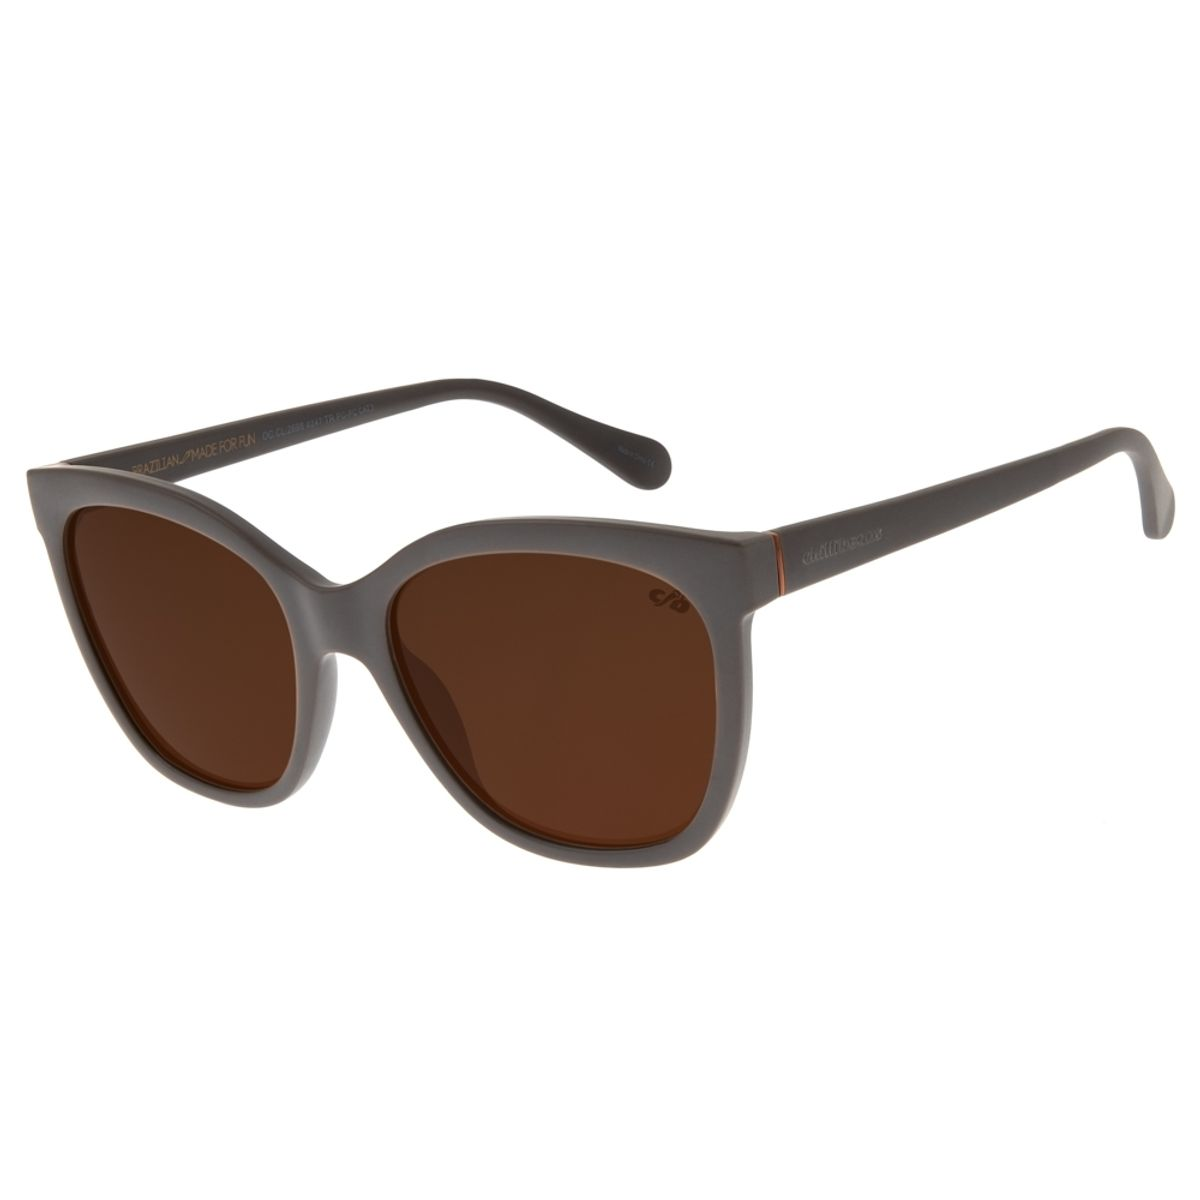 f9b7df86f Óculos de Sol Feminino Chilli Beans Clássico Quadrado Marrom Escuro ...